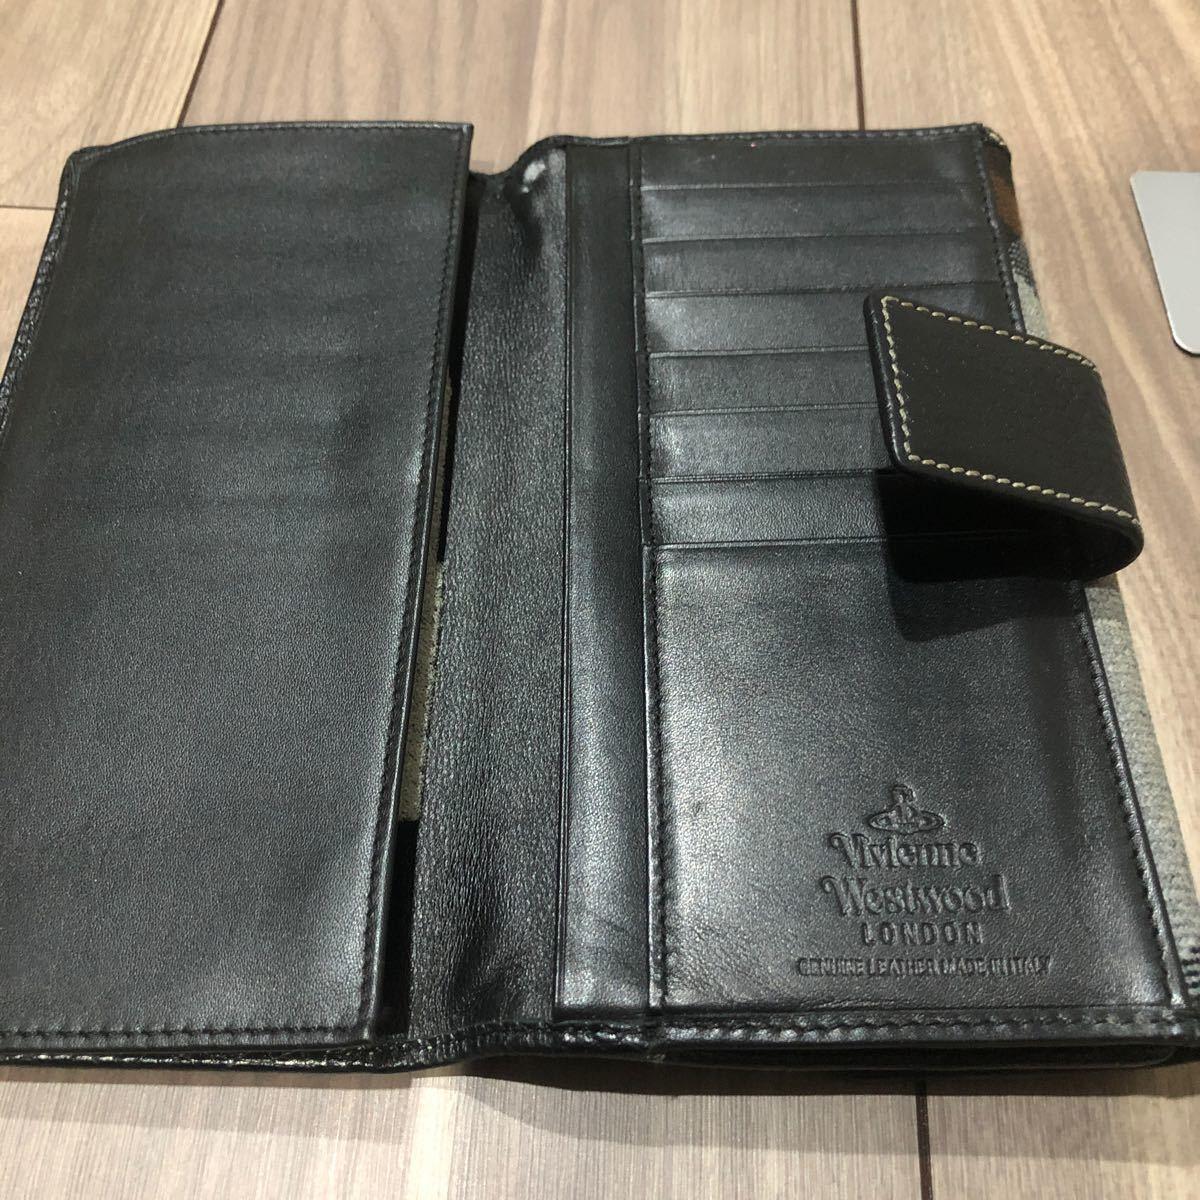 Vivienne Westwood ヴィヴィアンウエストウッド 長財布 財布